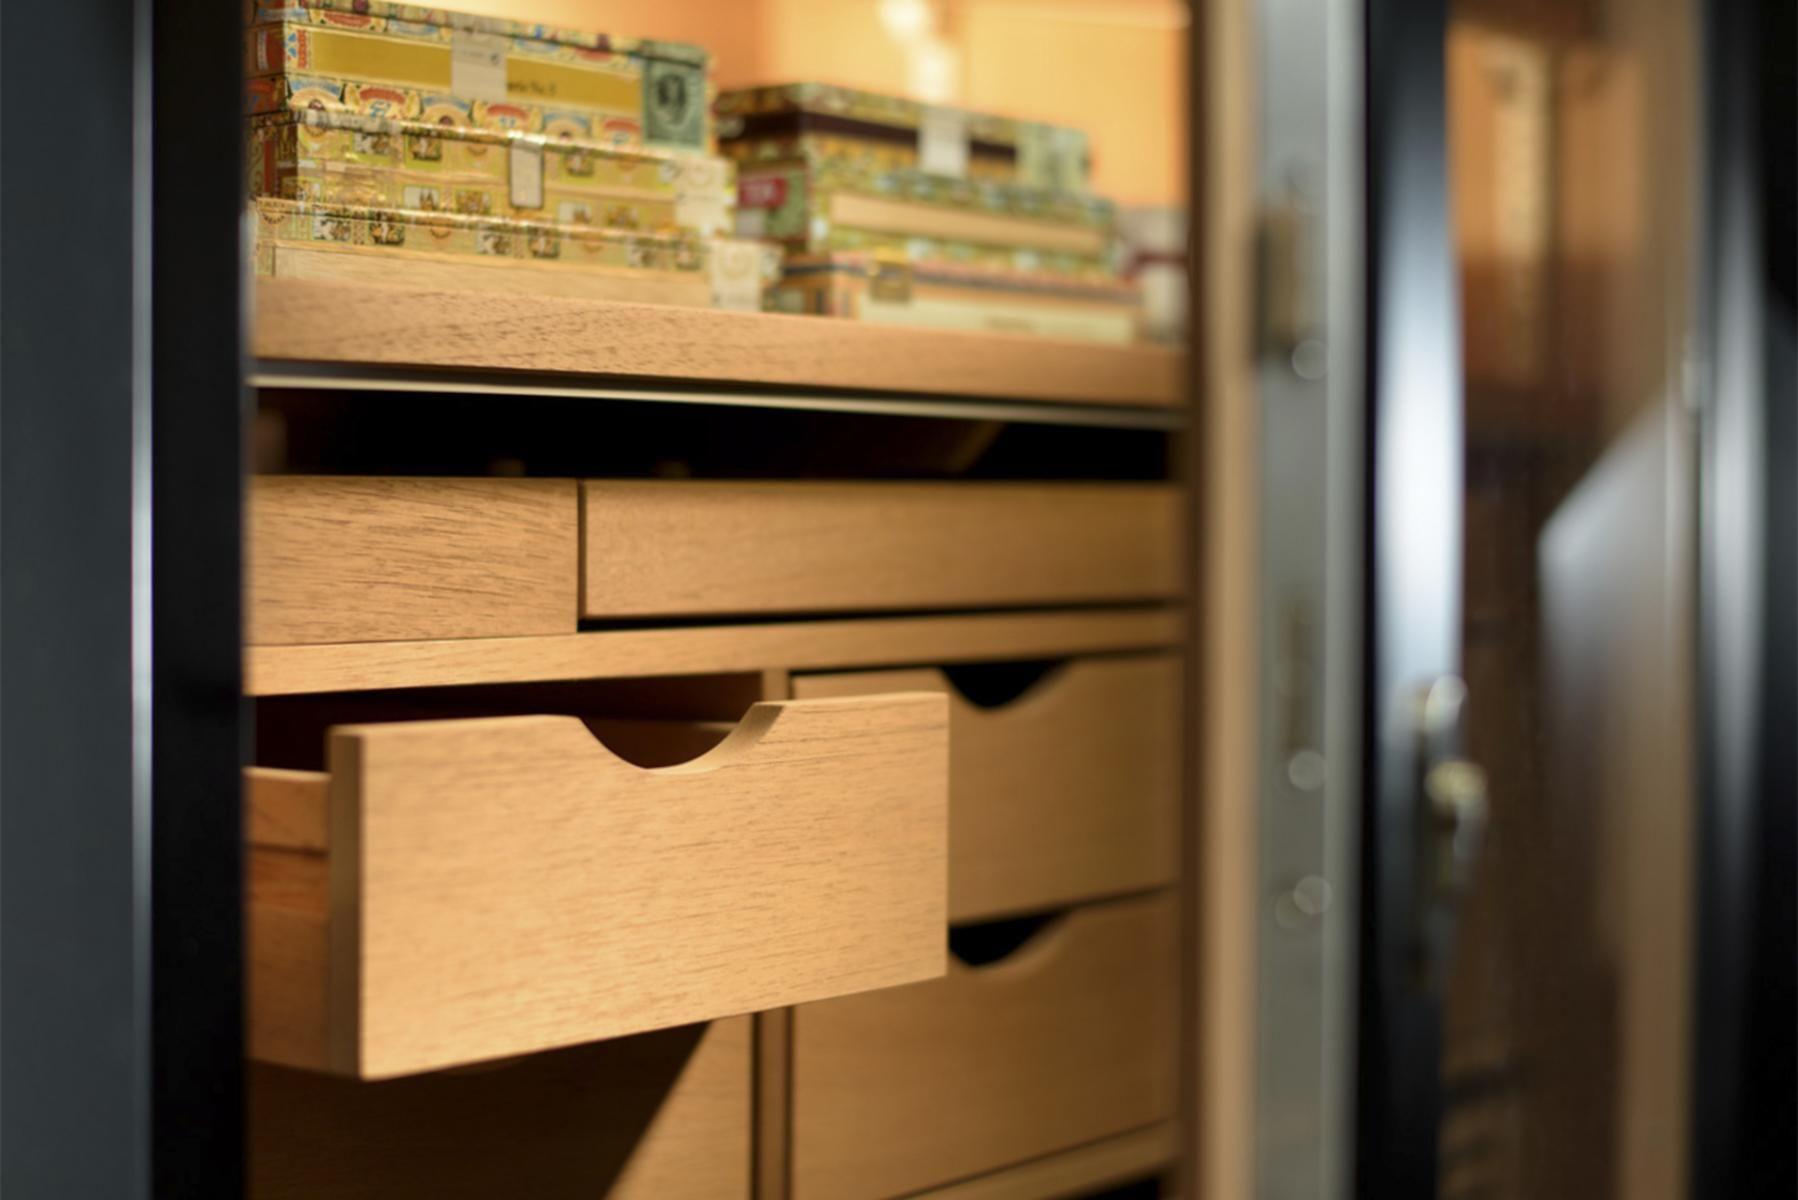 Gerber Humidor No 1 Innenraum Aus Spanischer Zeder Zedernholz Zigarren Holz